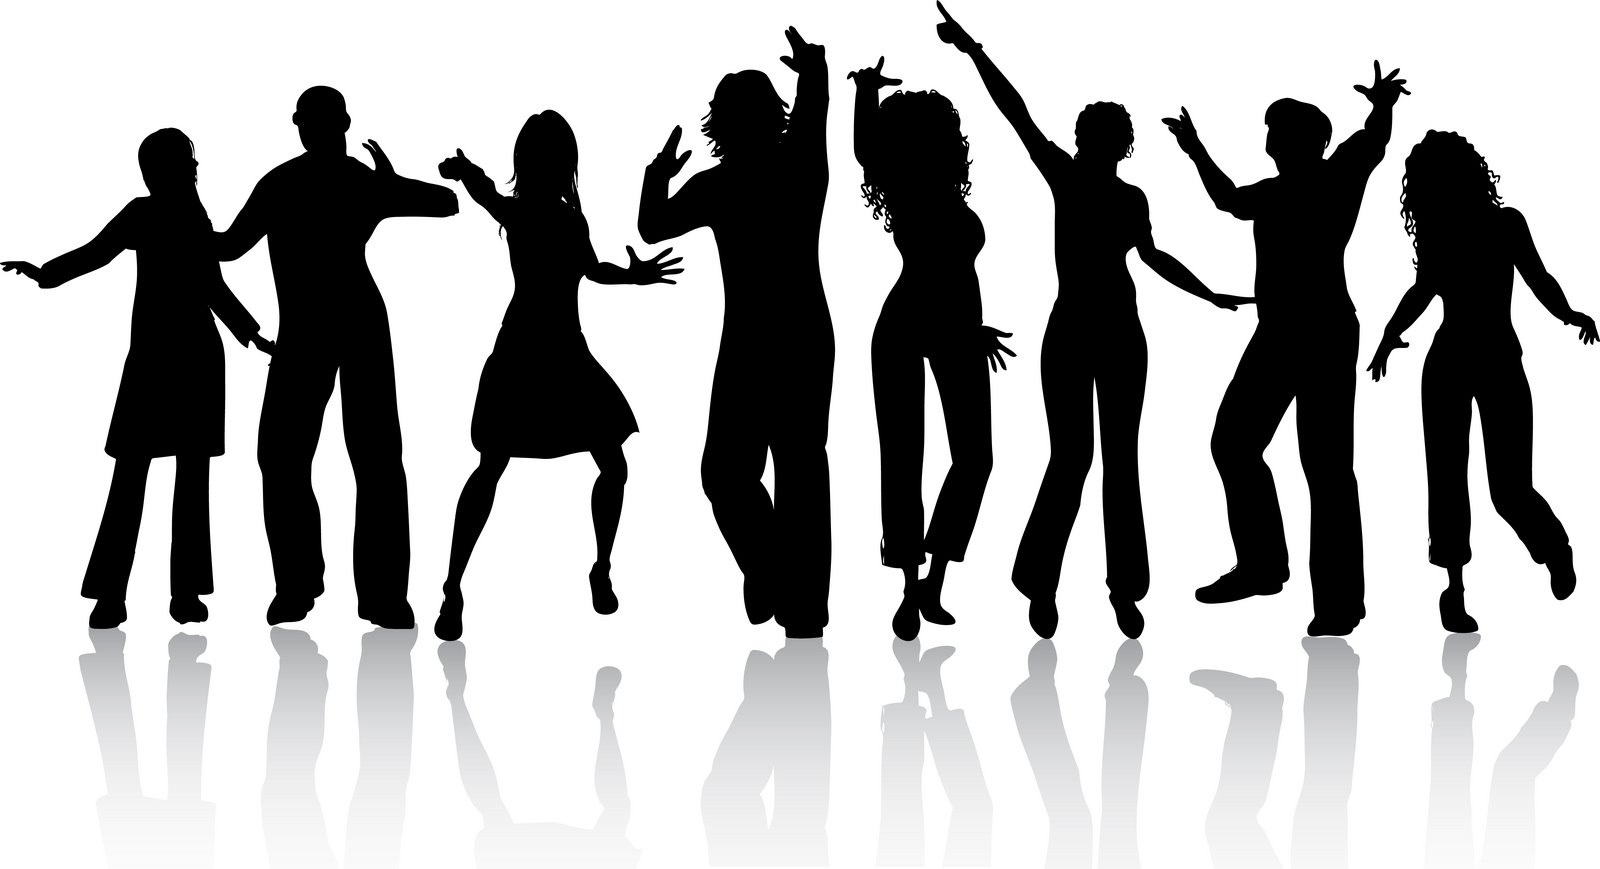 dance-silhouette-clip-art-964673.jpg